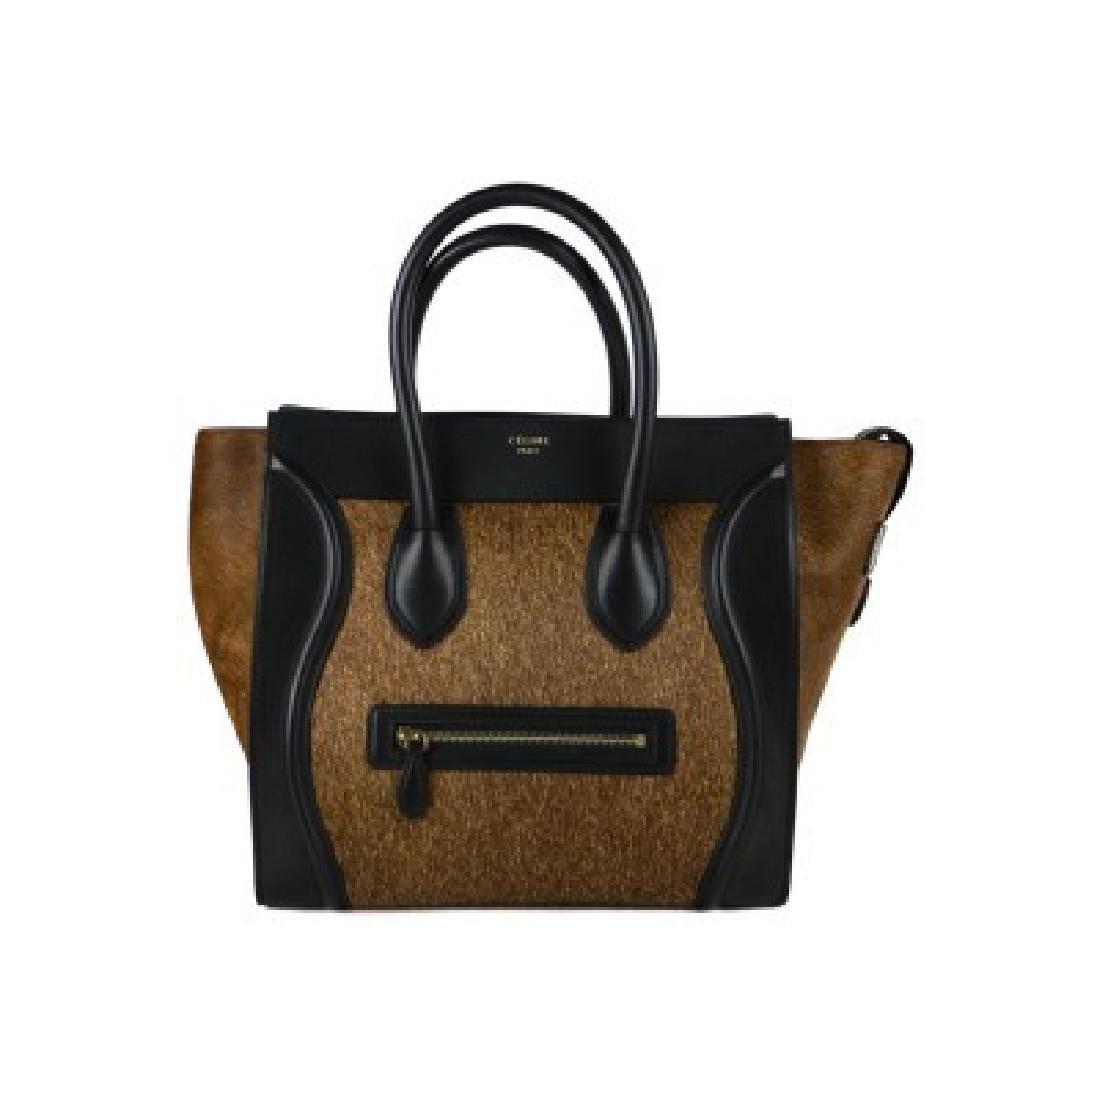 Celine Handbag Luggage Tote Bag